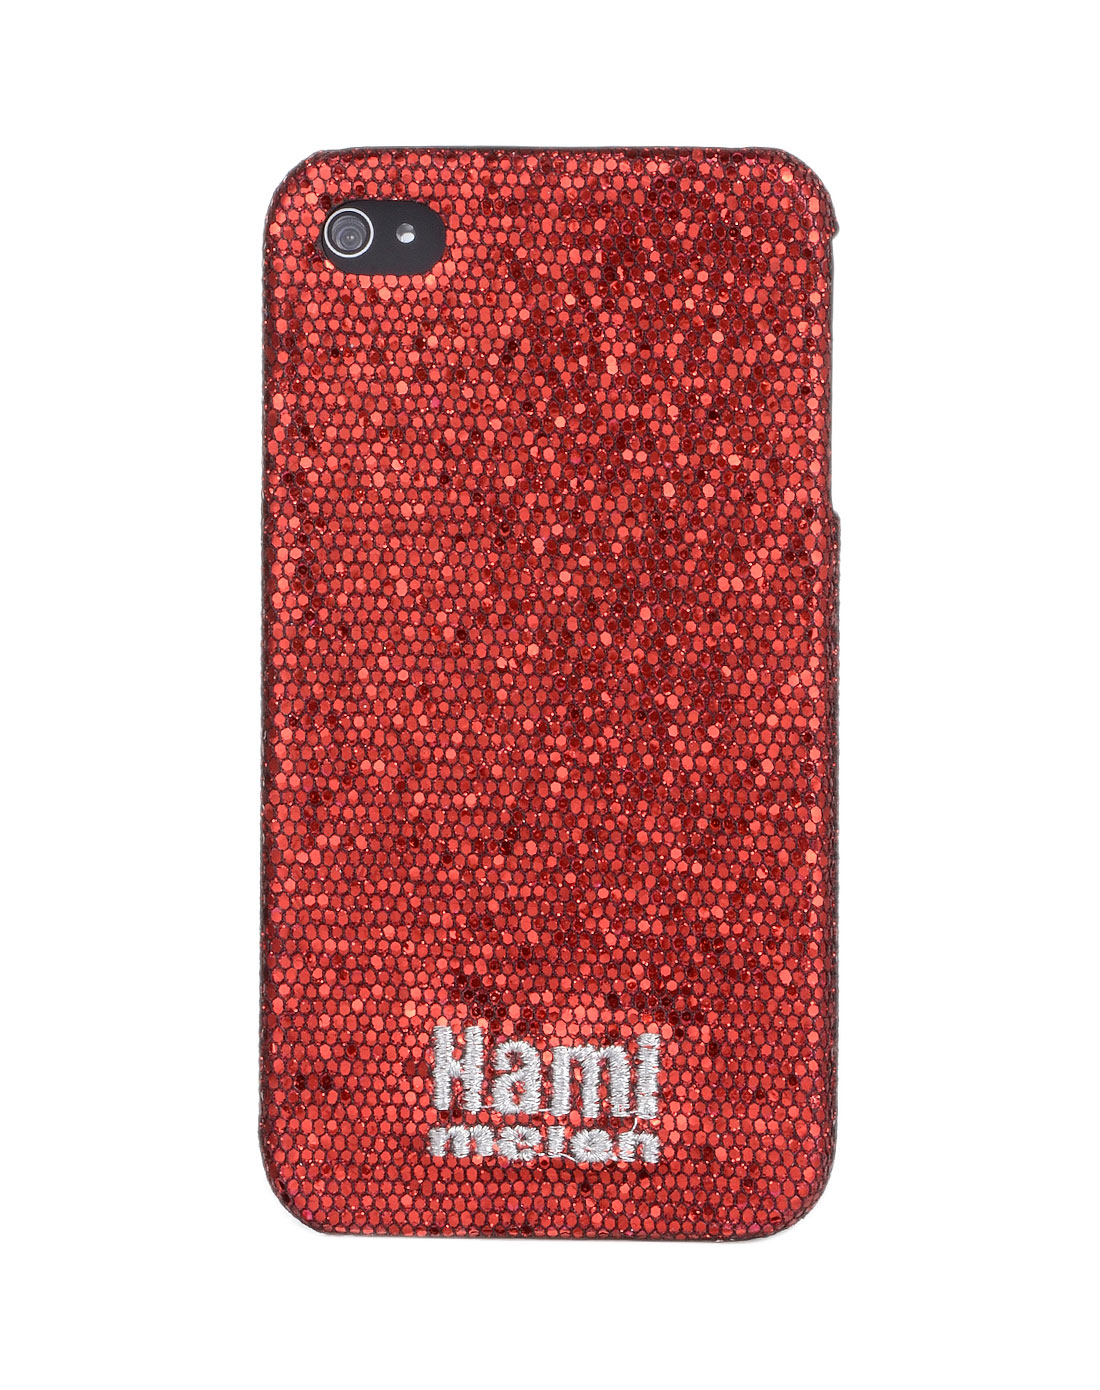 hamimelon iphone4/4s通用保护壳-深红色小亮片鱼鳞